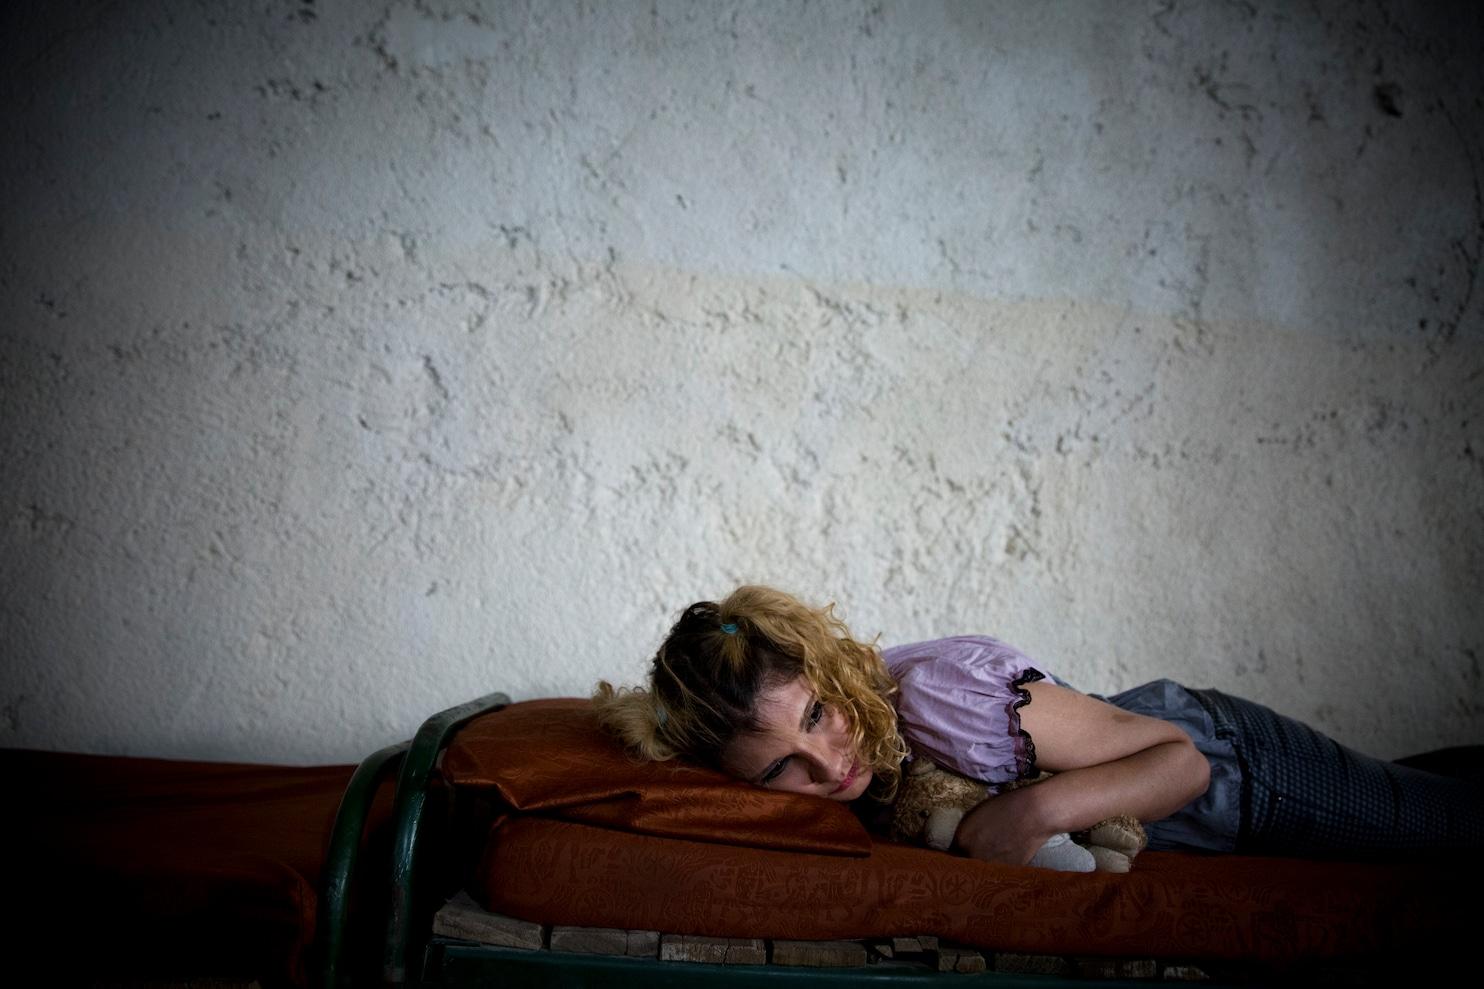 Women Addicted To Drugs In Iran Begin Seeking Treatment